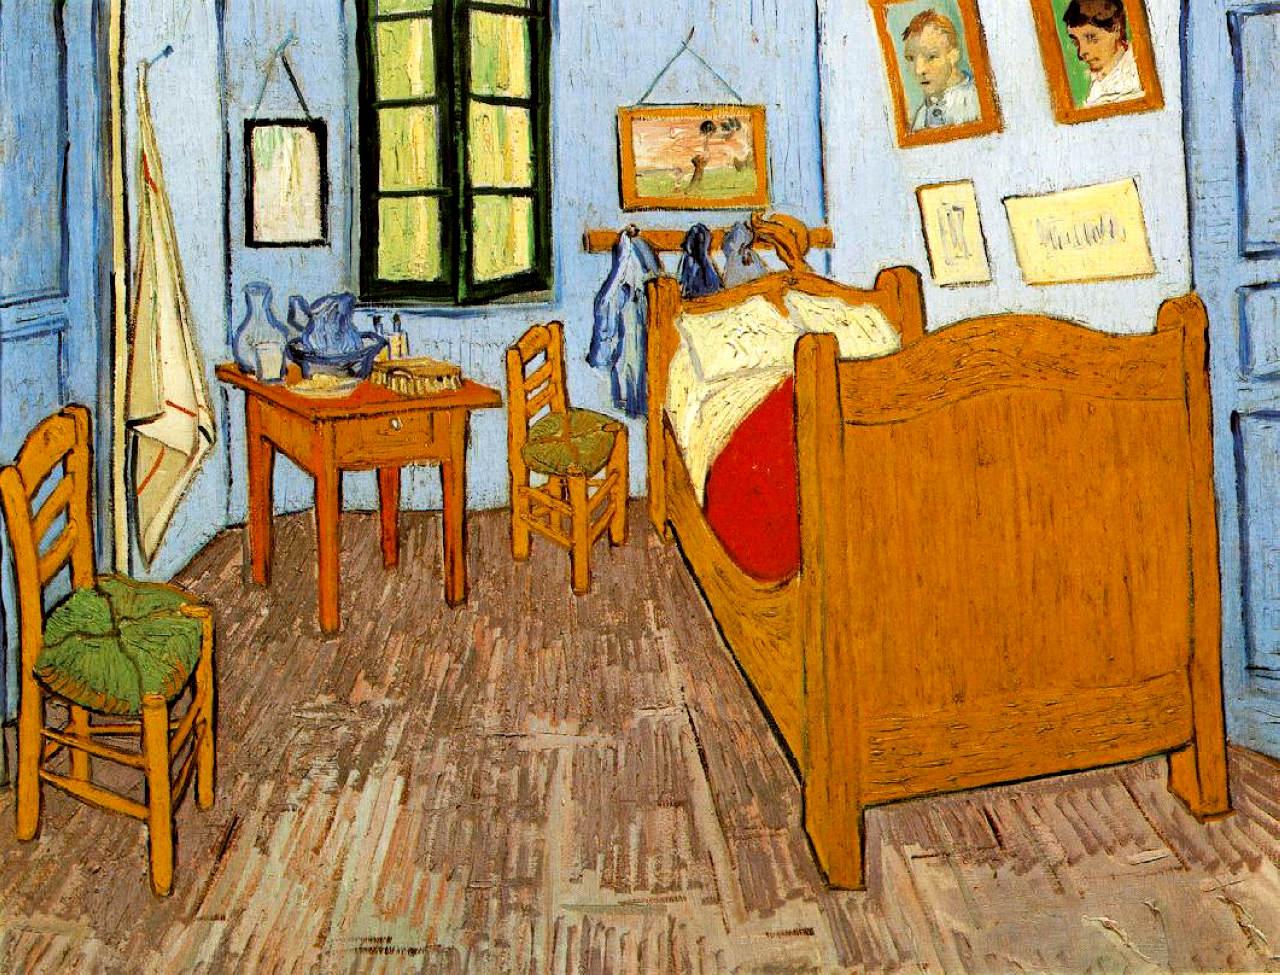 Vincent\'s Bedroom in Arles, 1889 - Vincent van Gogh - WikiArt.org